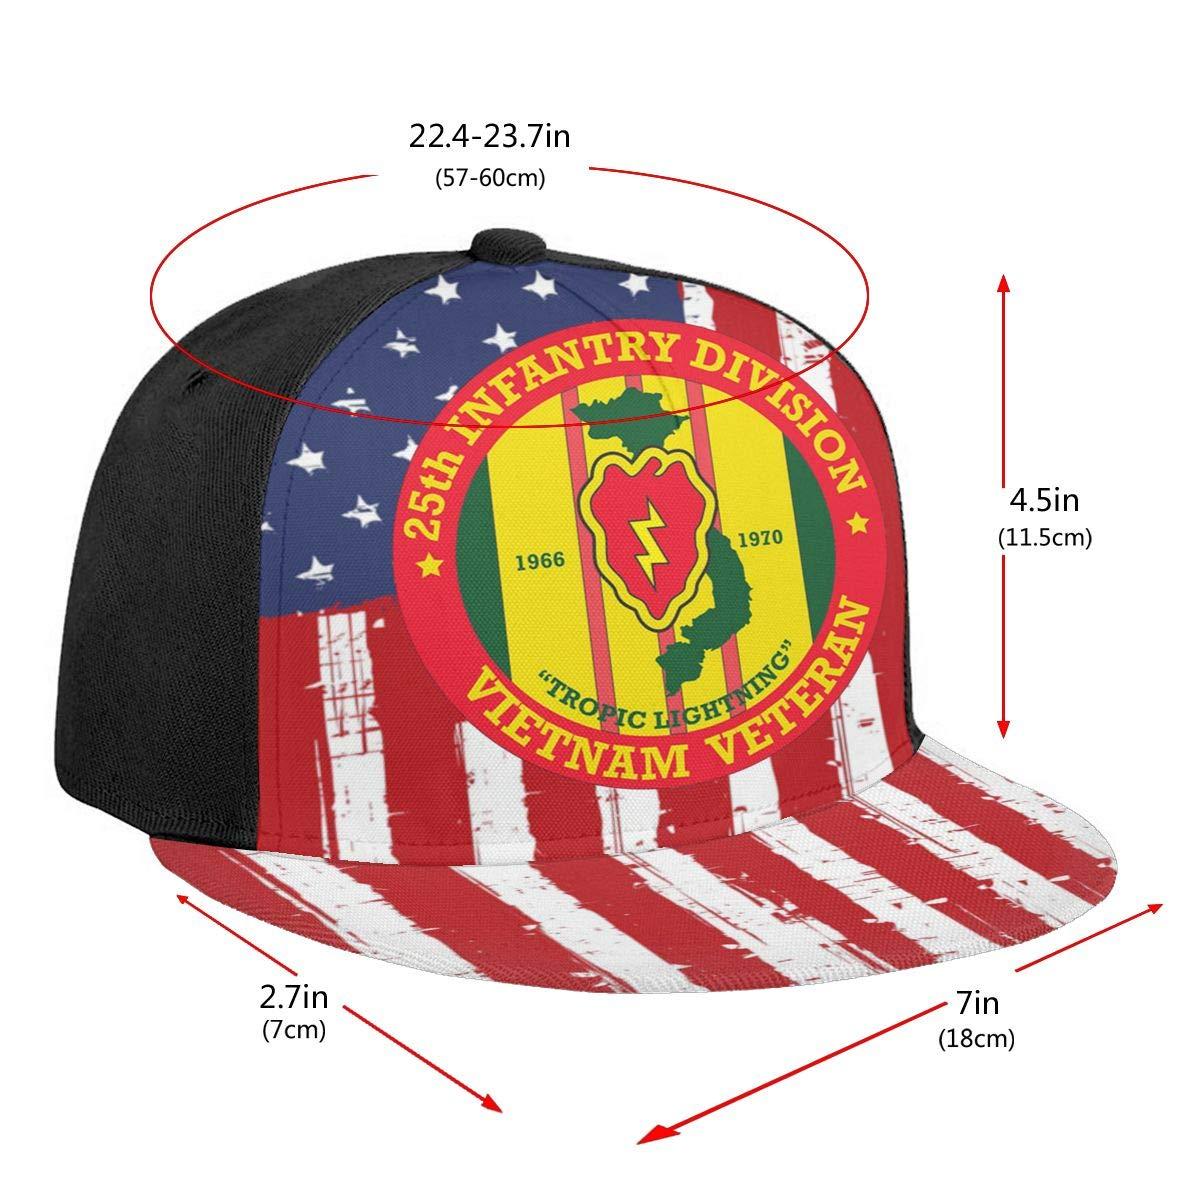 25th Infantry Division Vietnam Veteran Unisex Adult Hats Classic Baseball Caps Peaked Cap